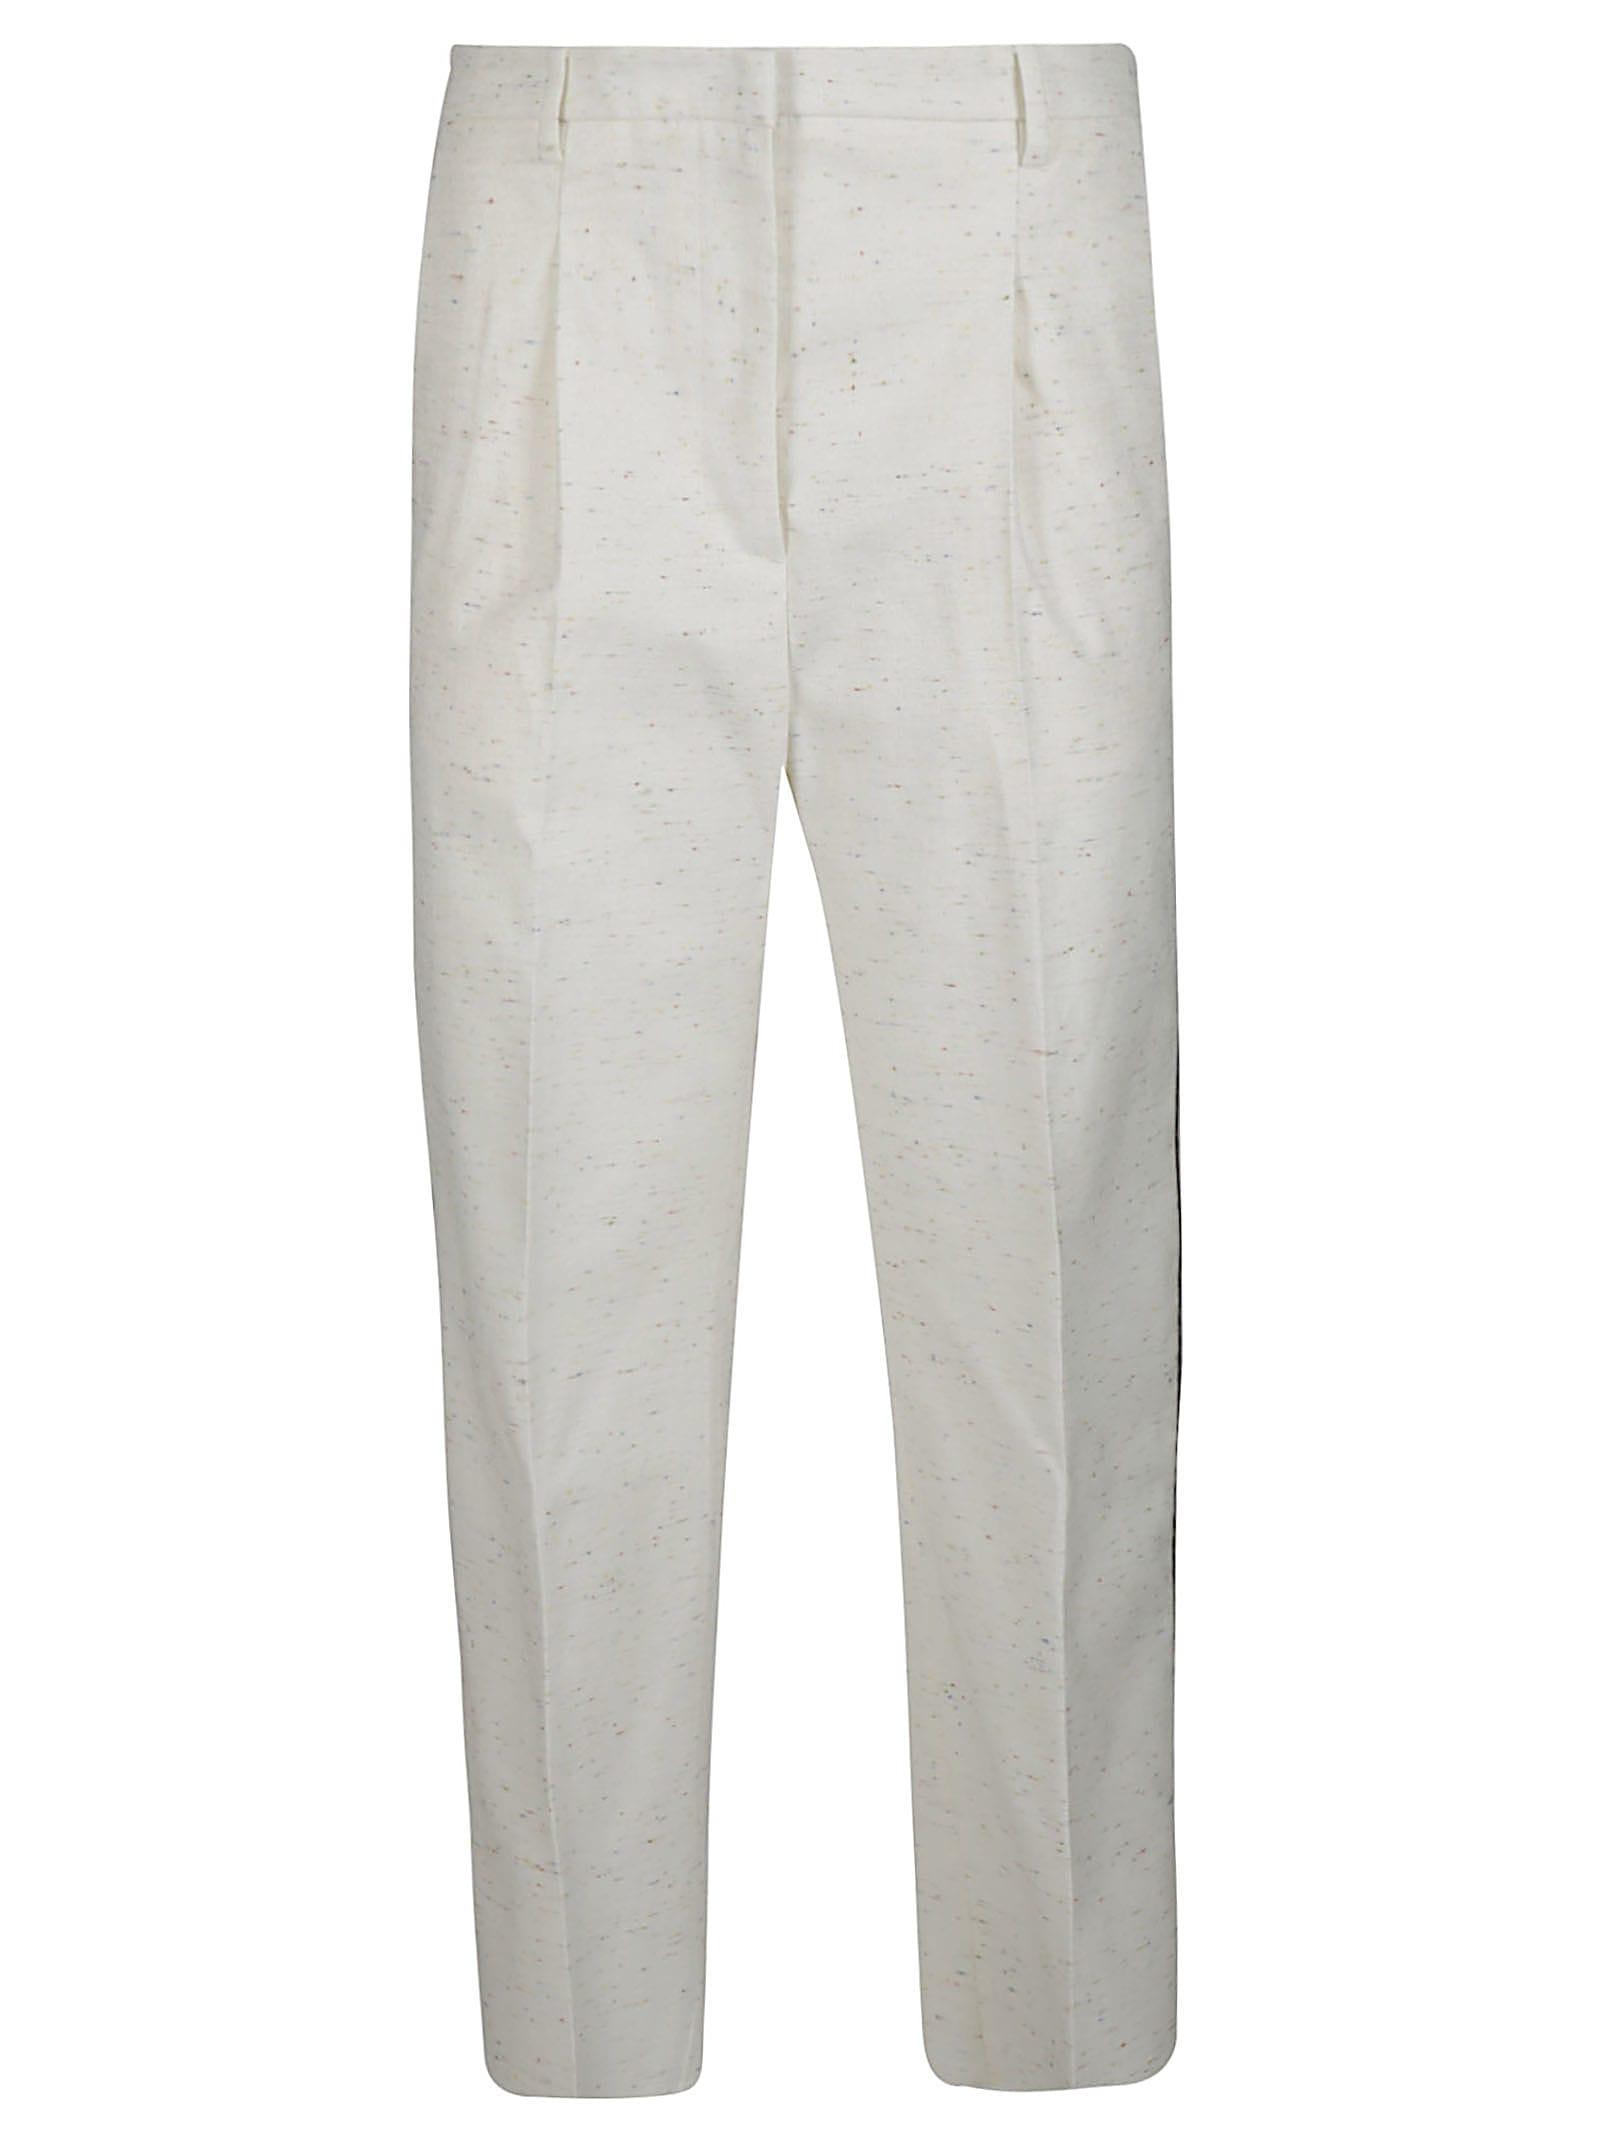 Golden Goose White Cotton Trousers